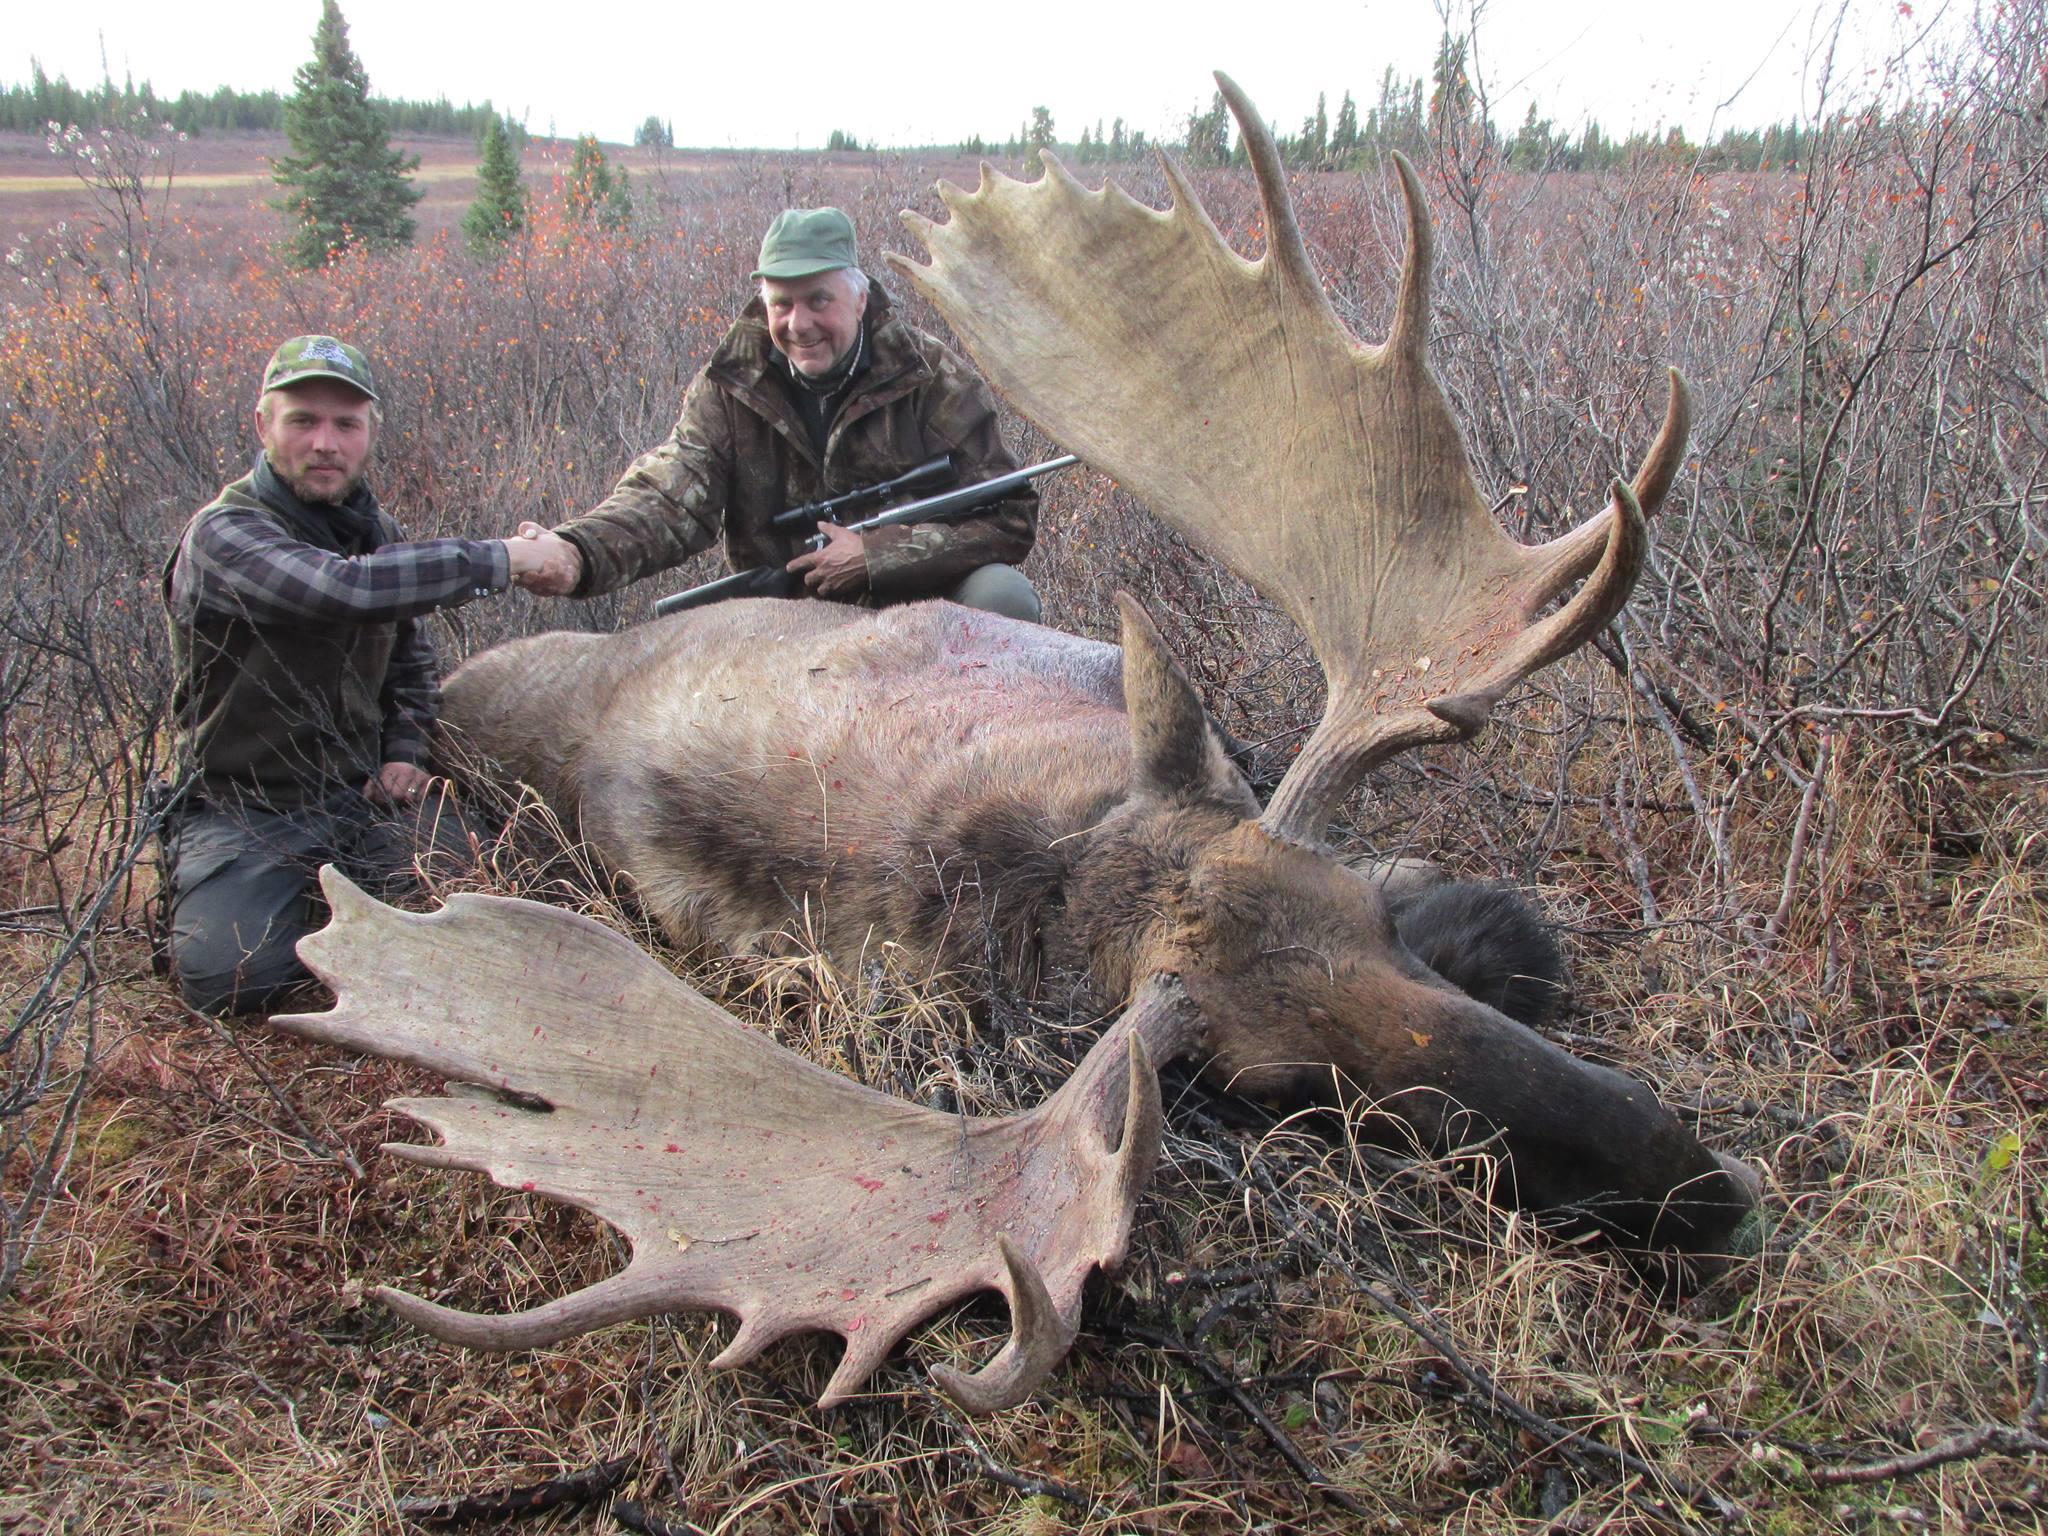 moose hunting in british columbia 3